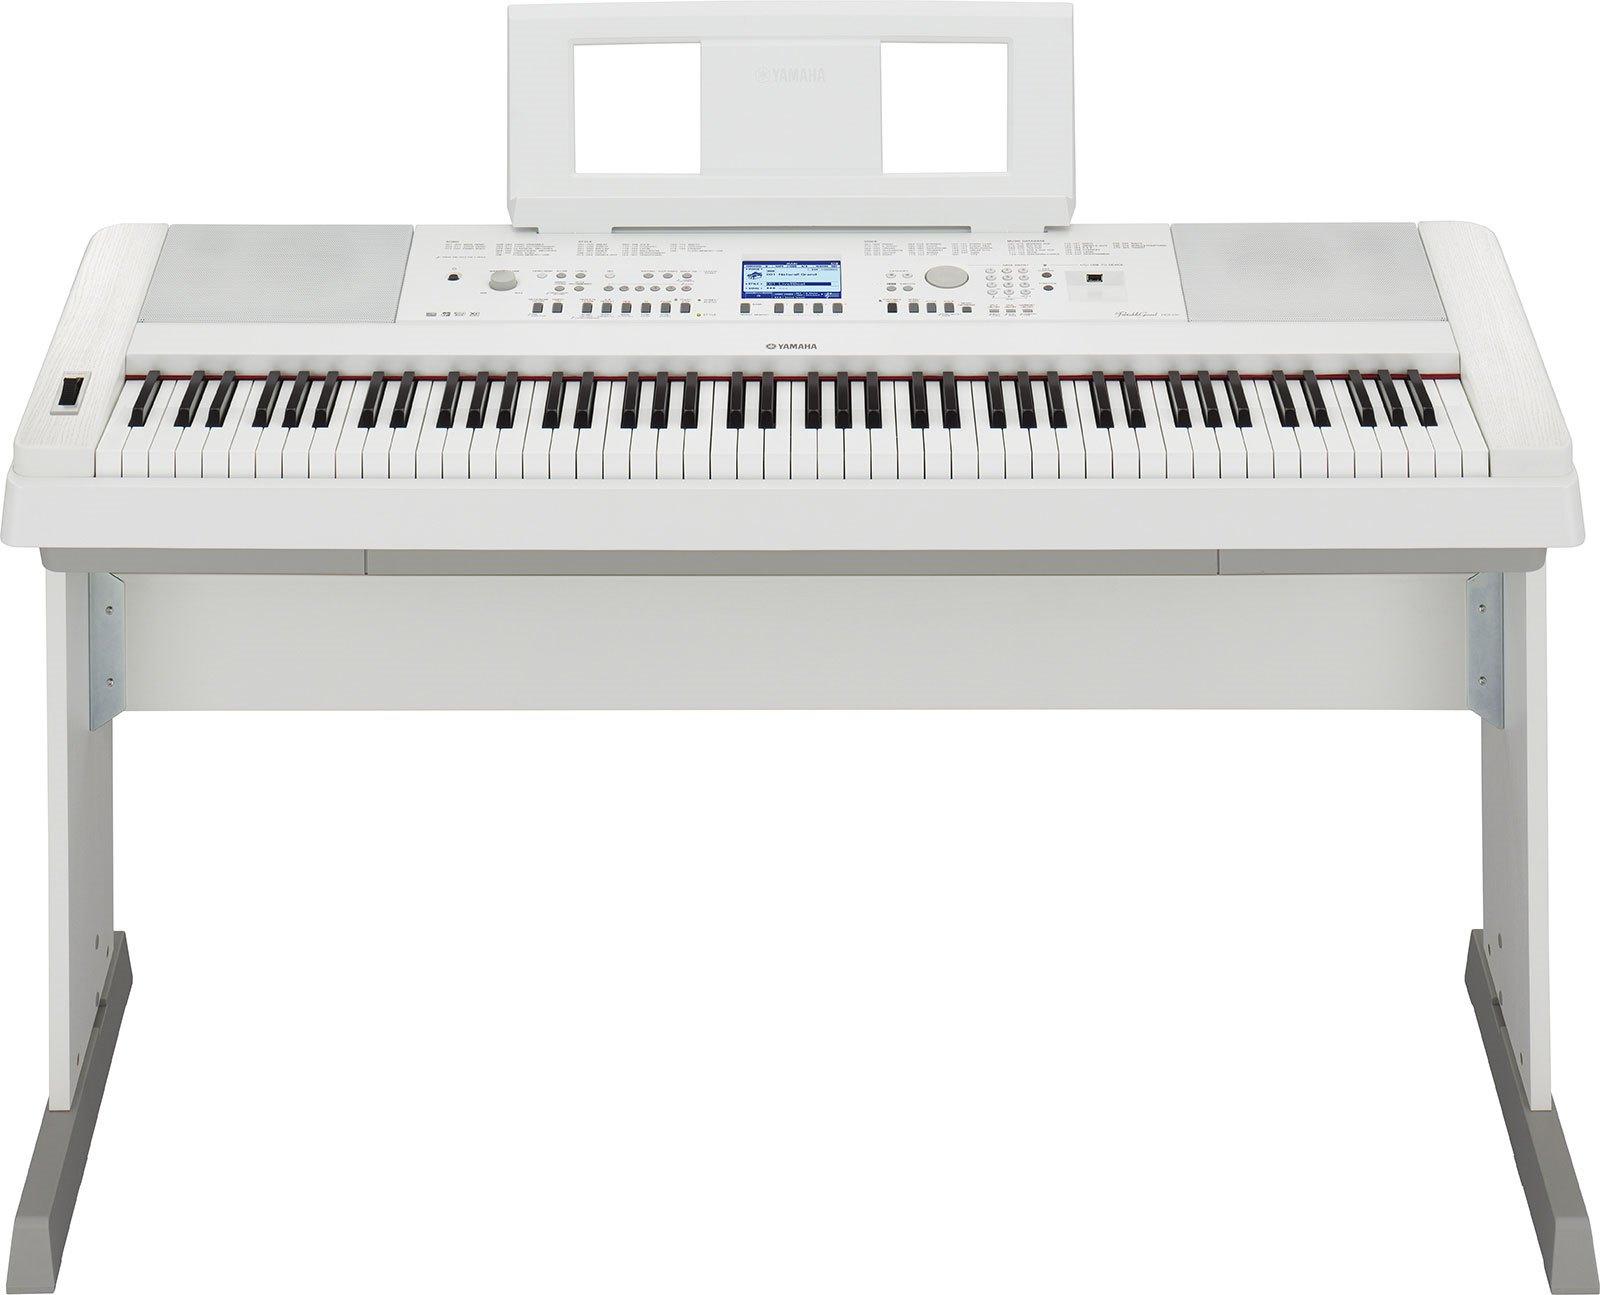 DGX-650 - Downloads - Portable Grand - Pianos - Musical